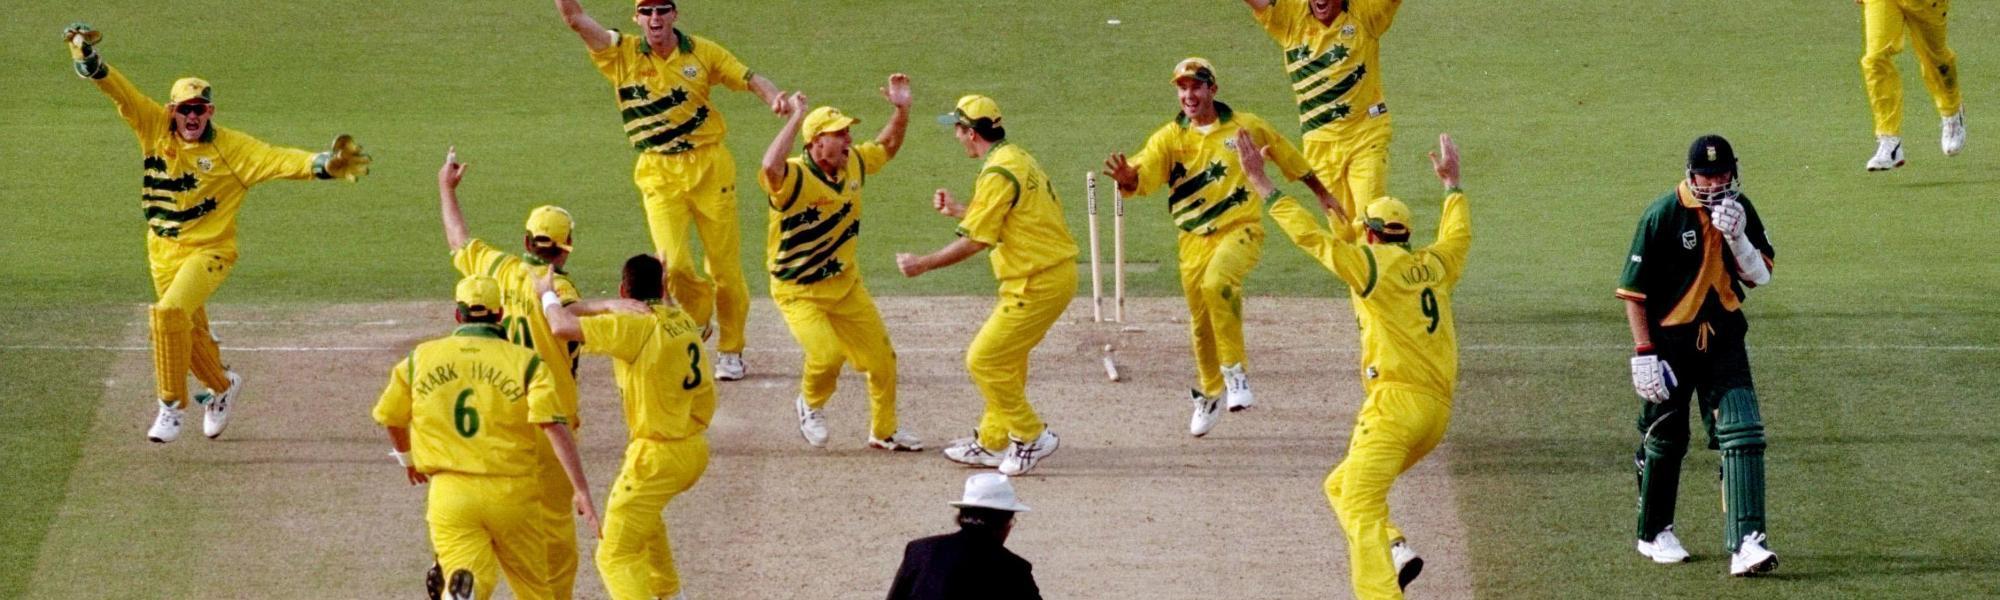 Australia v South Africa 1999 semi-final